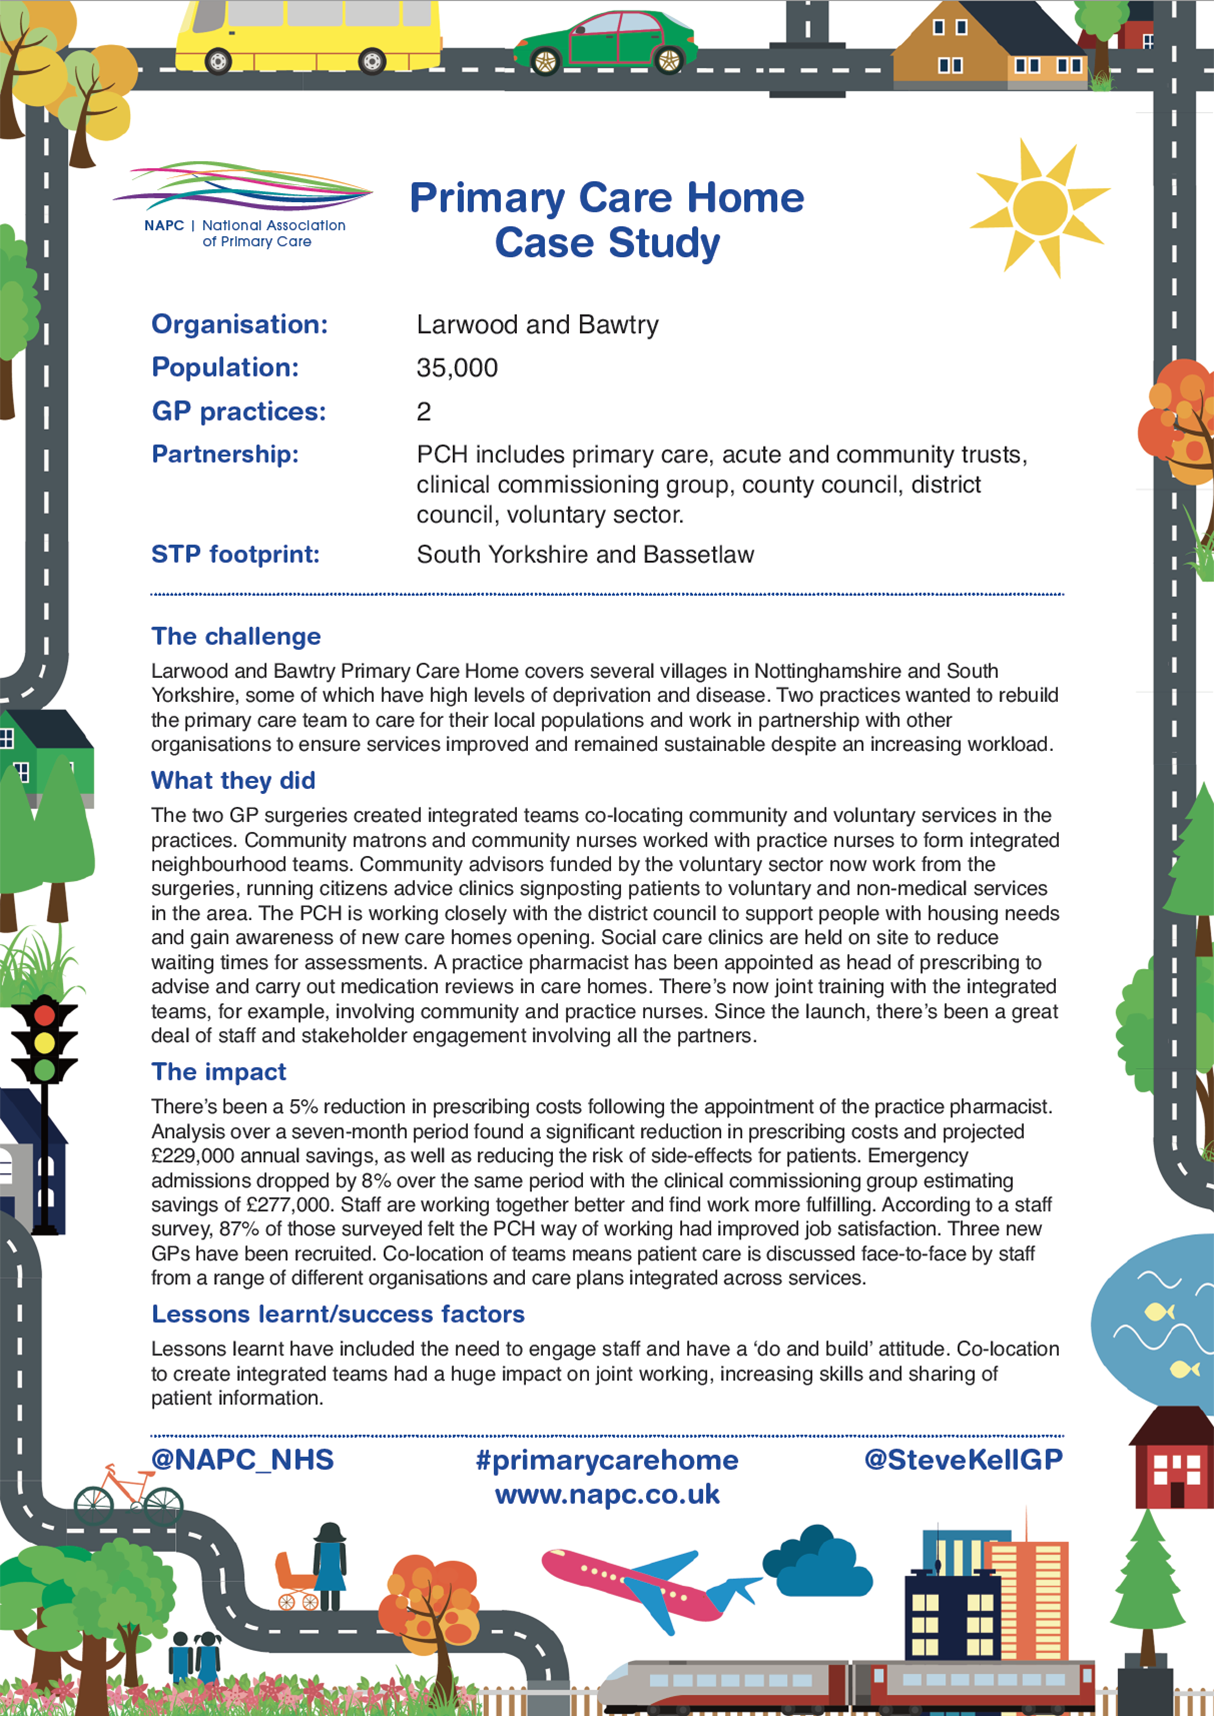 Case study - Larwood and Bawtry